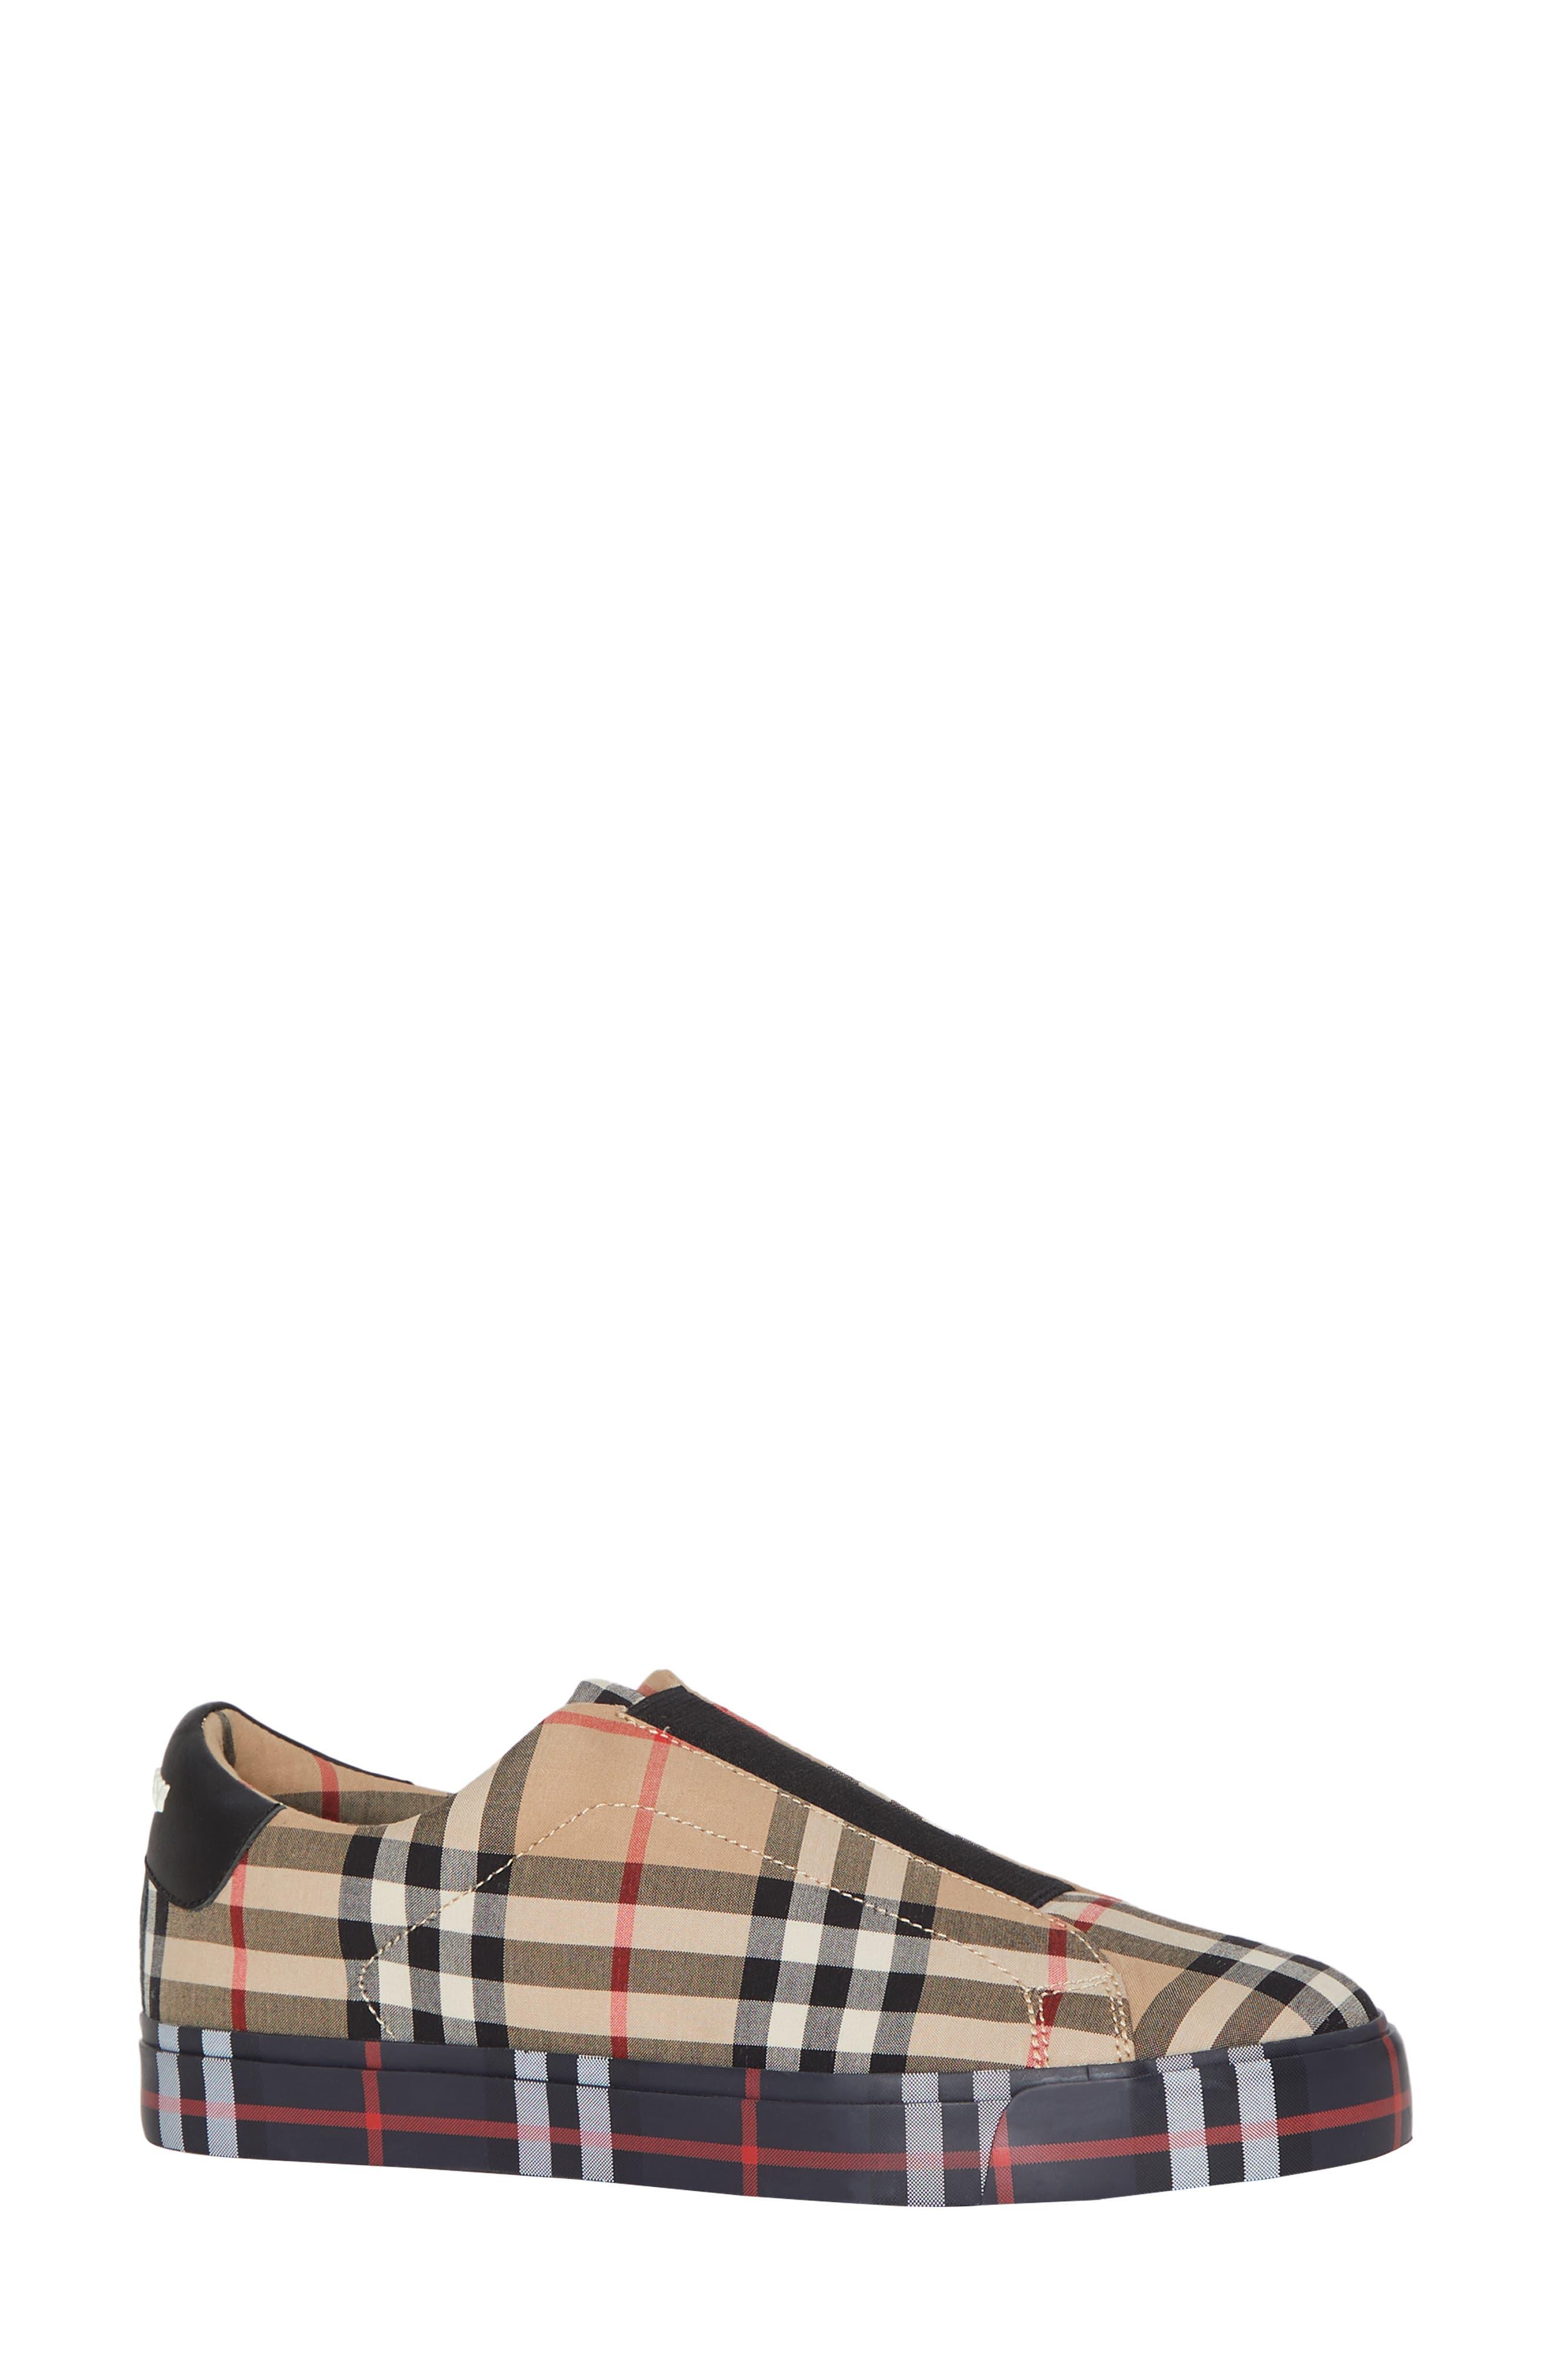 BURBERRY, Markham Vintage Check Slip-On Sneaker, Main thumbnail 1, color, BEIGE PLAID